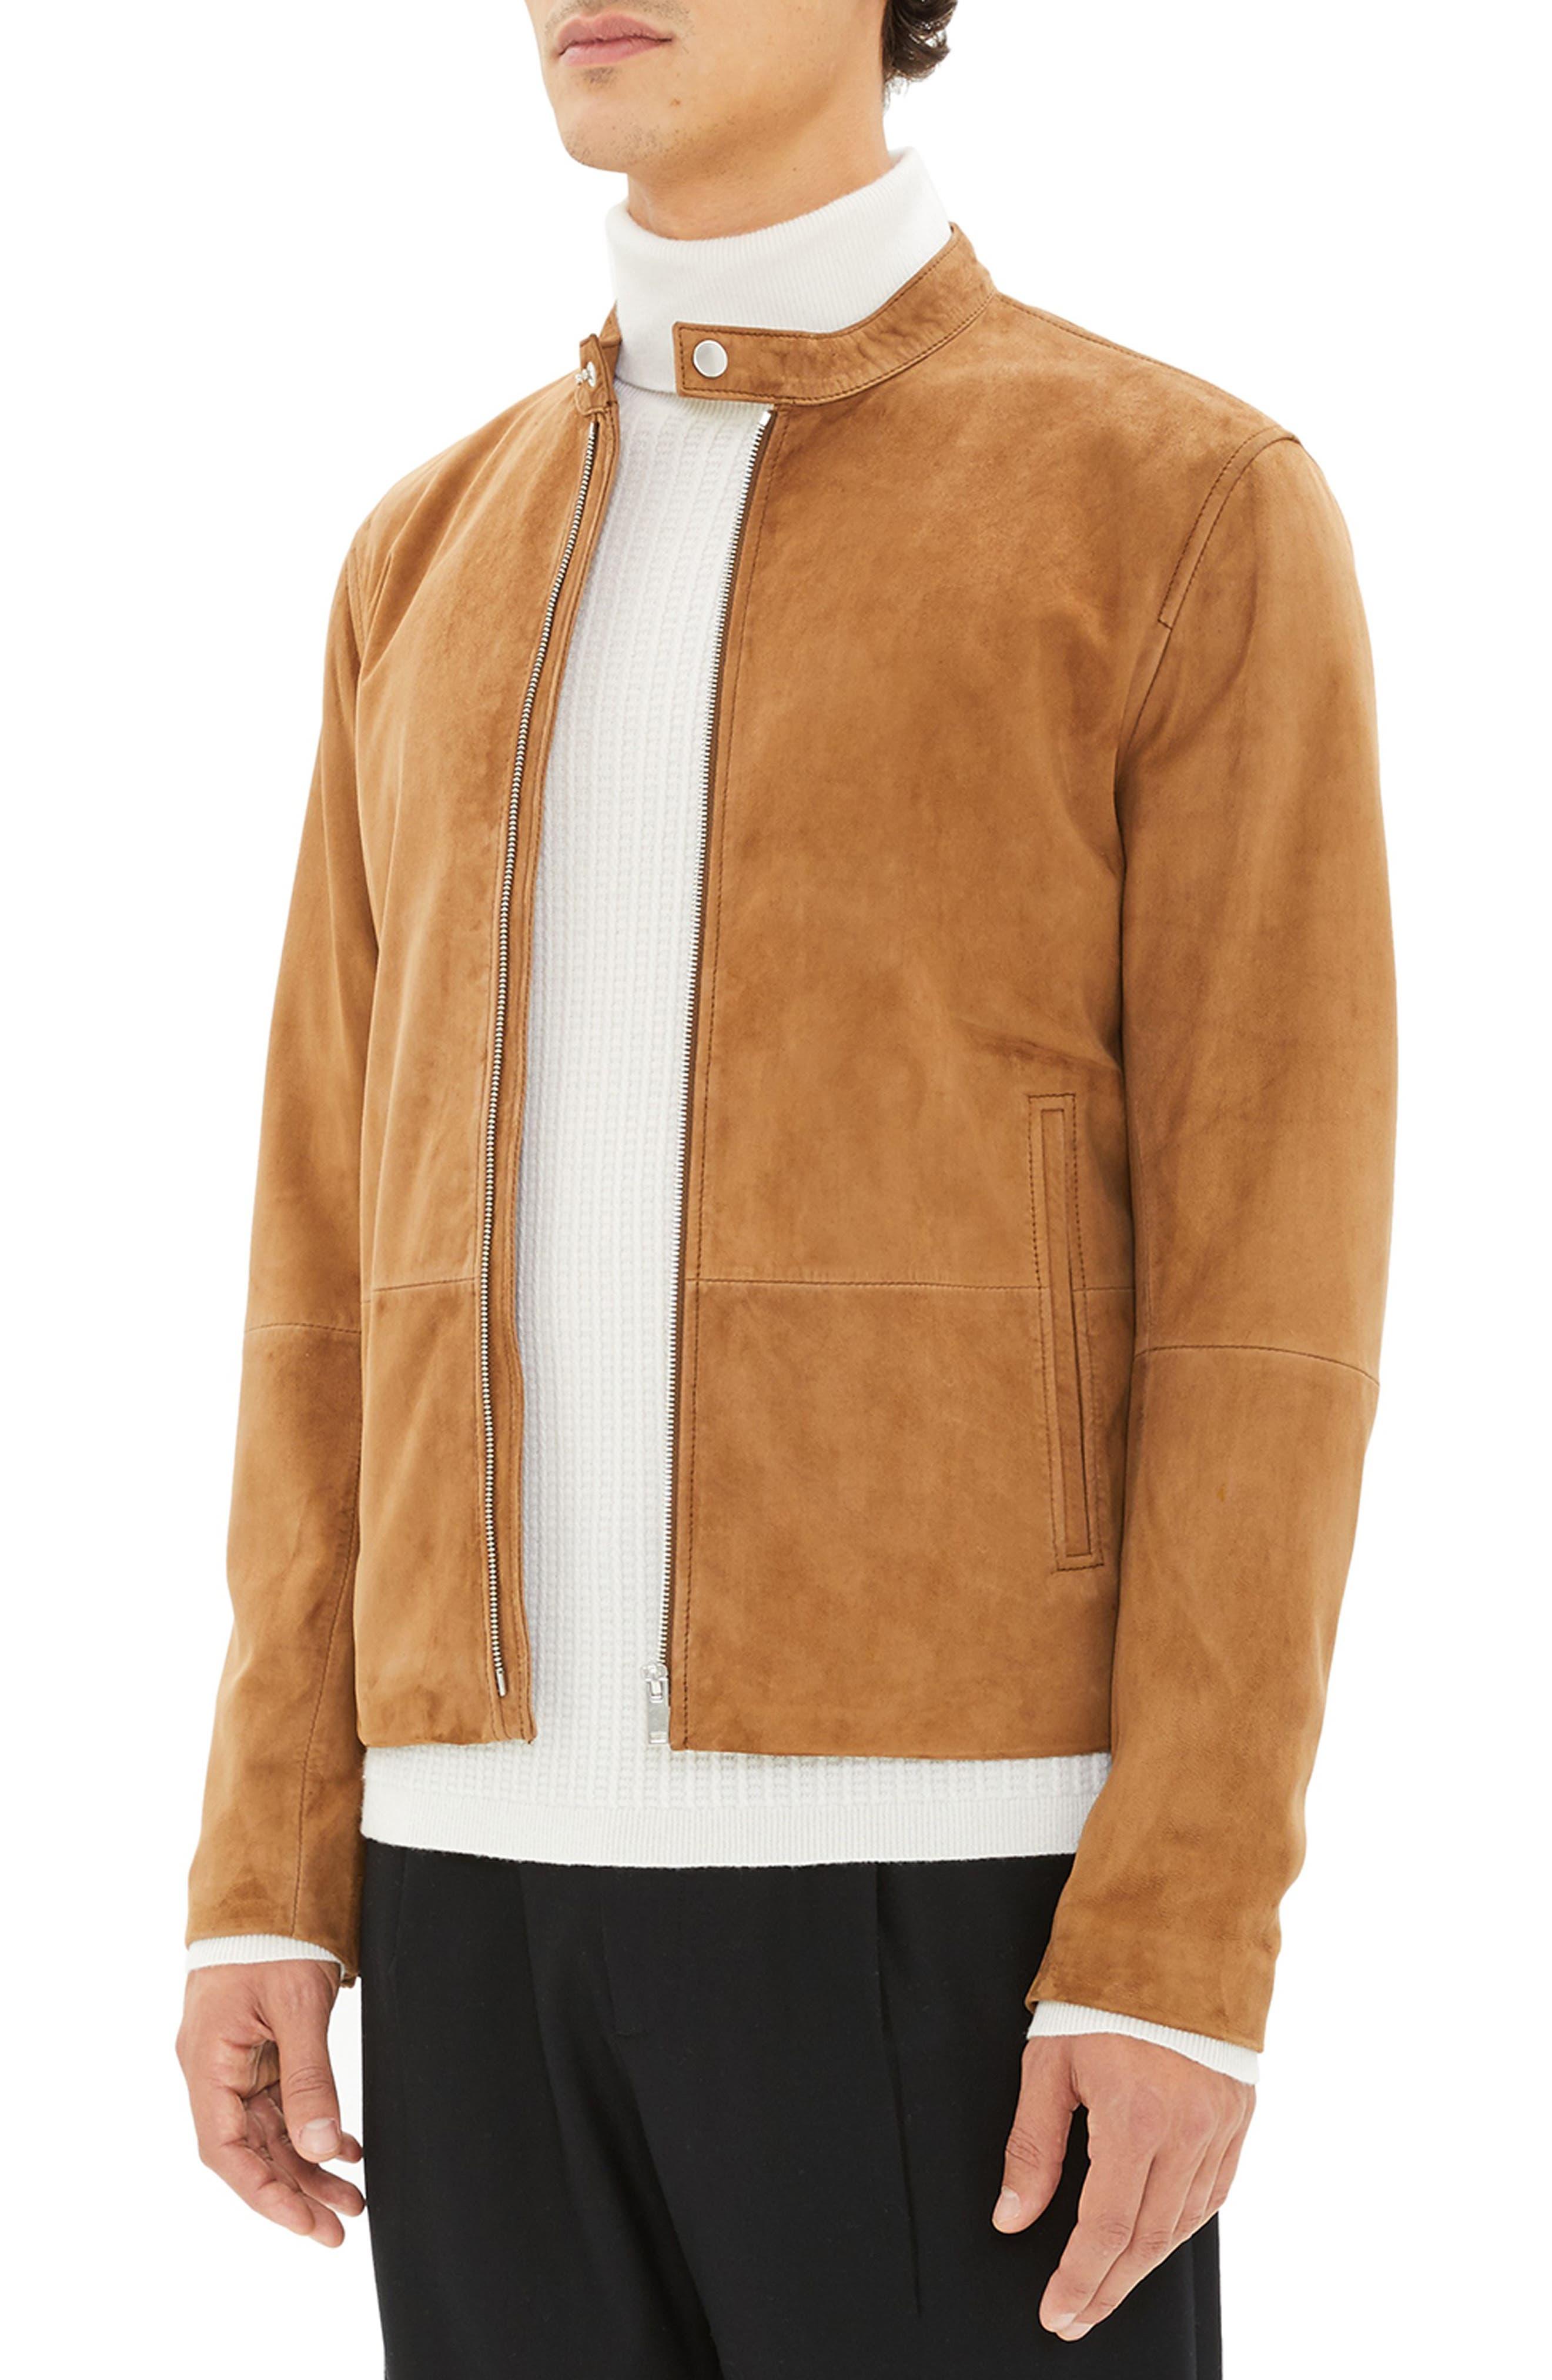 Wynwood Radic Leather Jacket,                             Alternate thumbnail 3, color,                             SANDSTORM